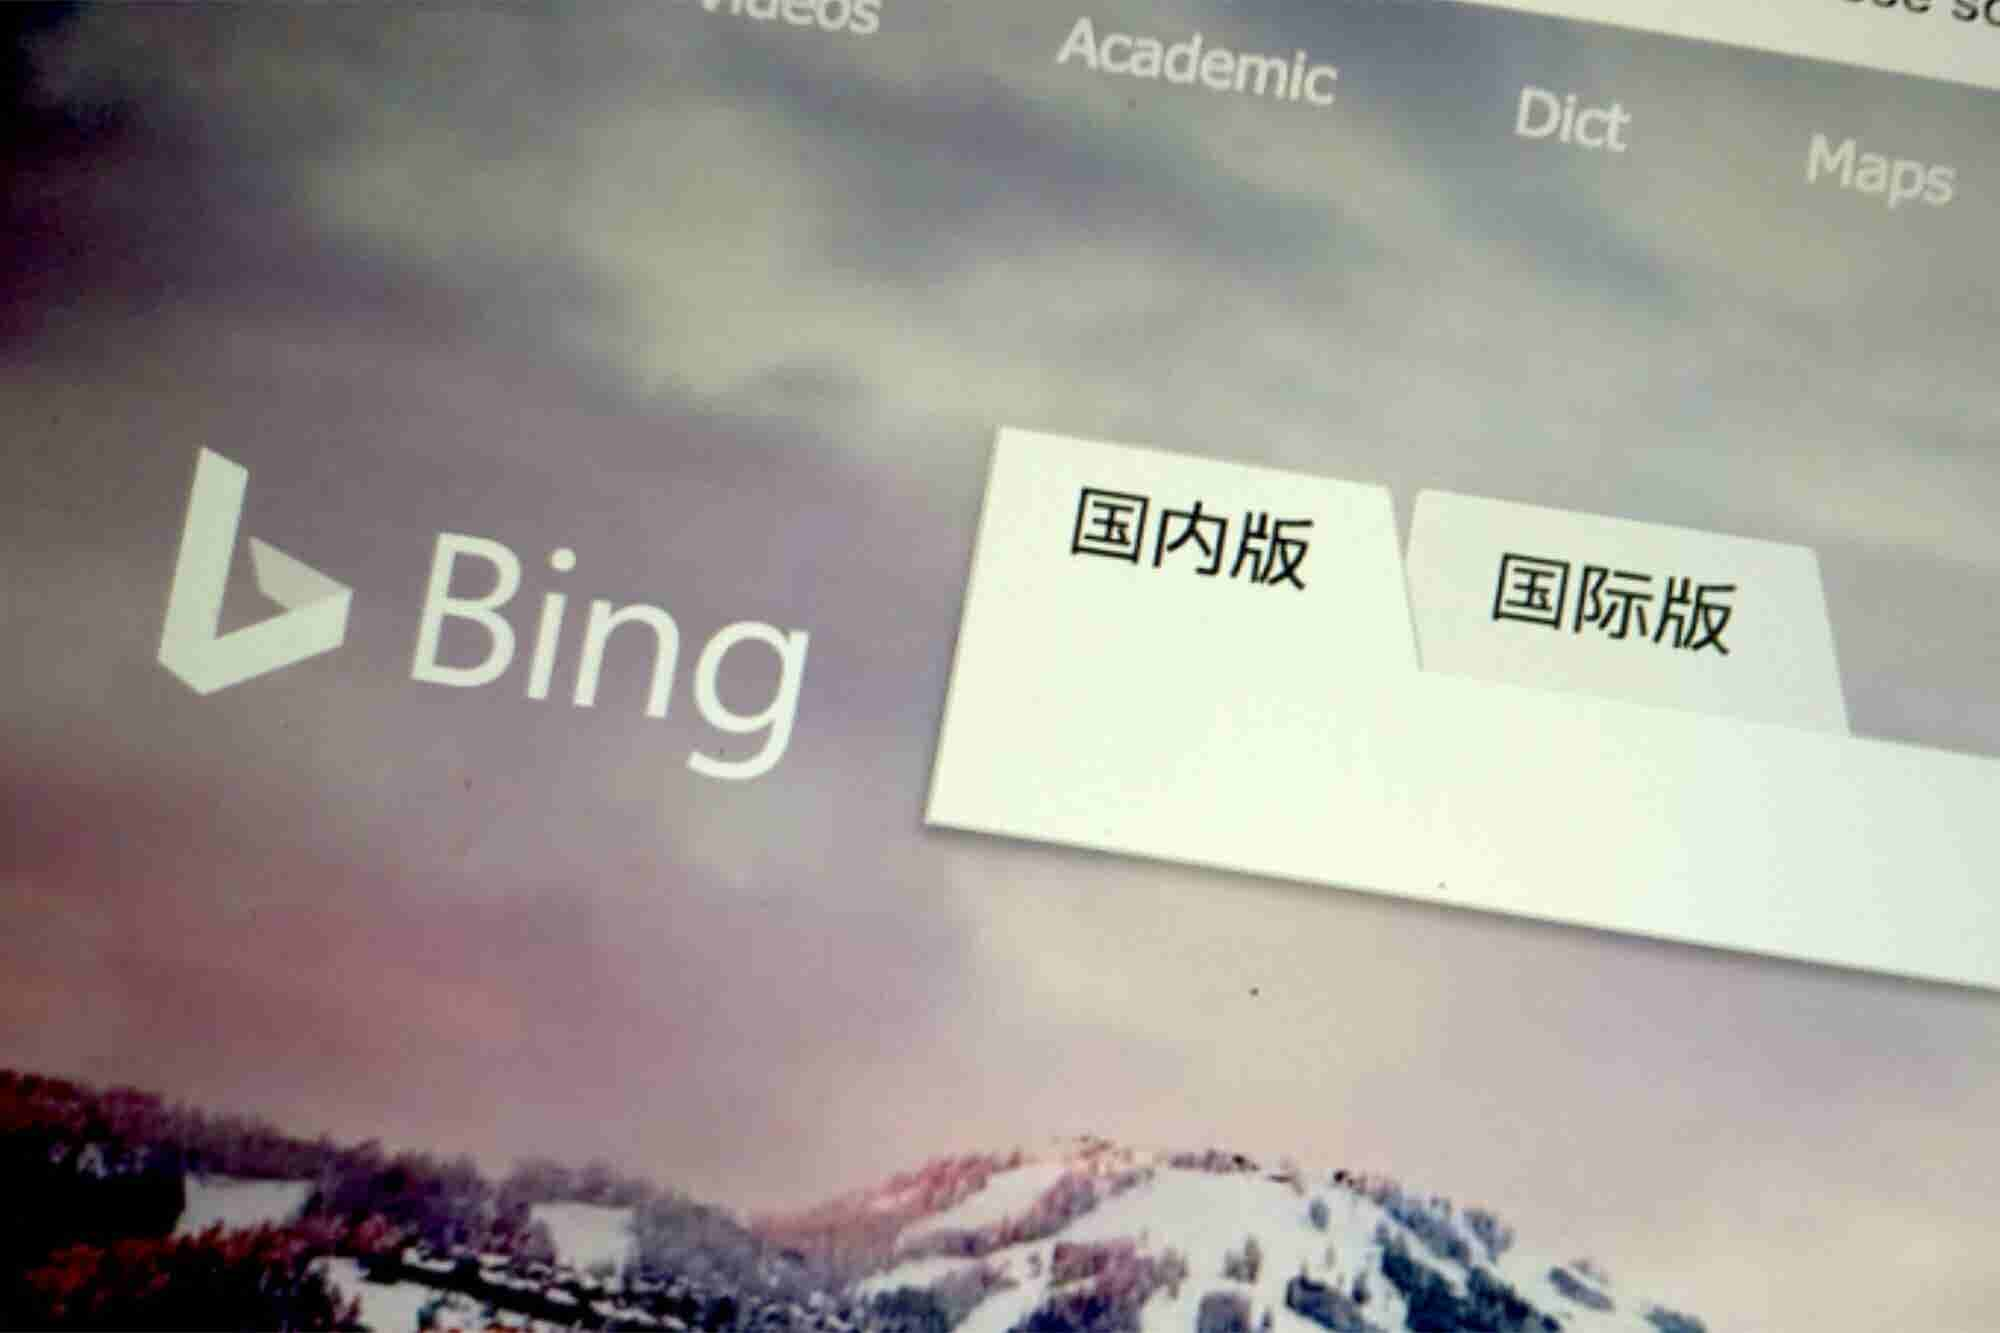 China Blocks Microsoft's Bing, Despite Offering Censored Search